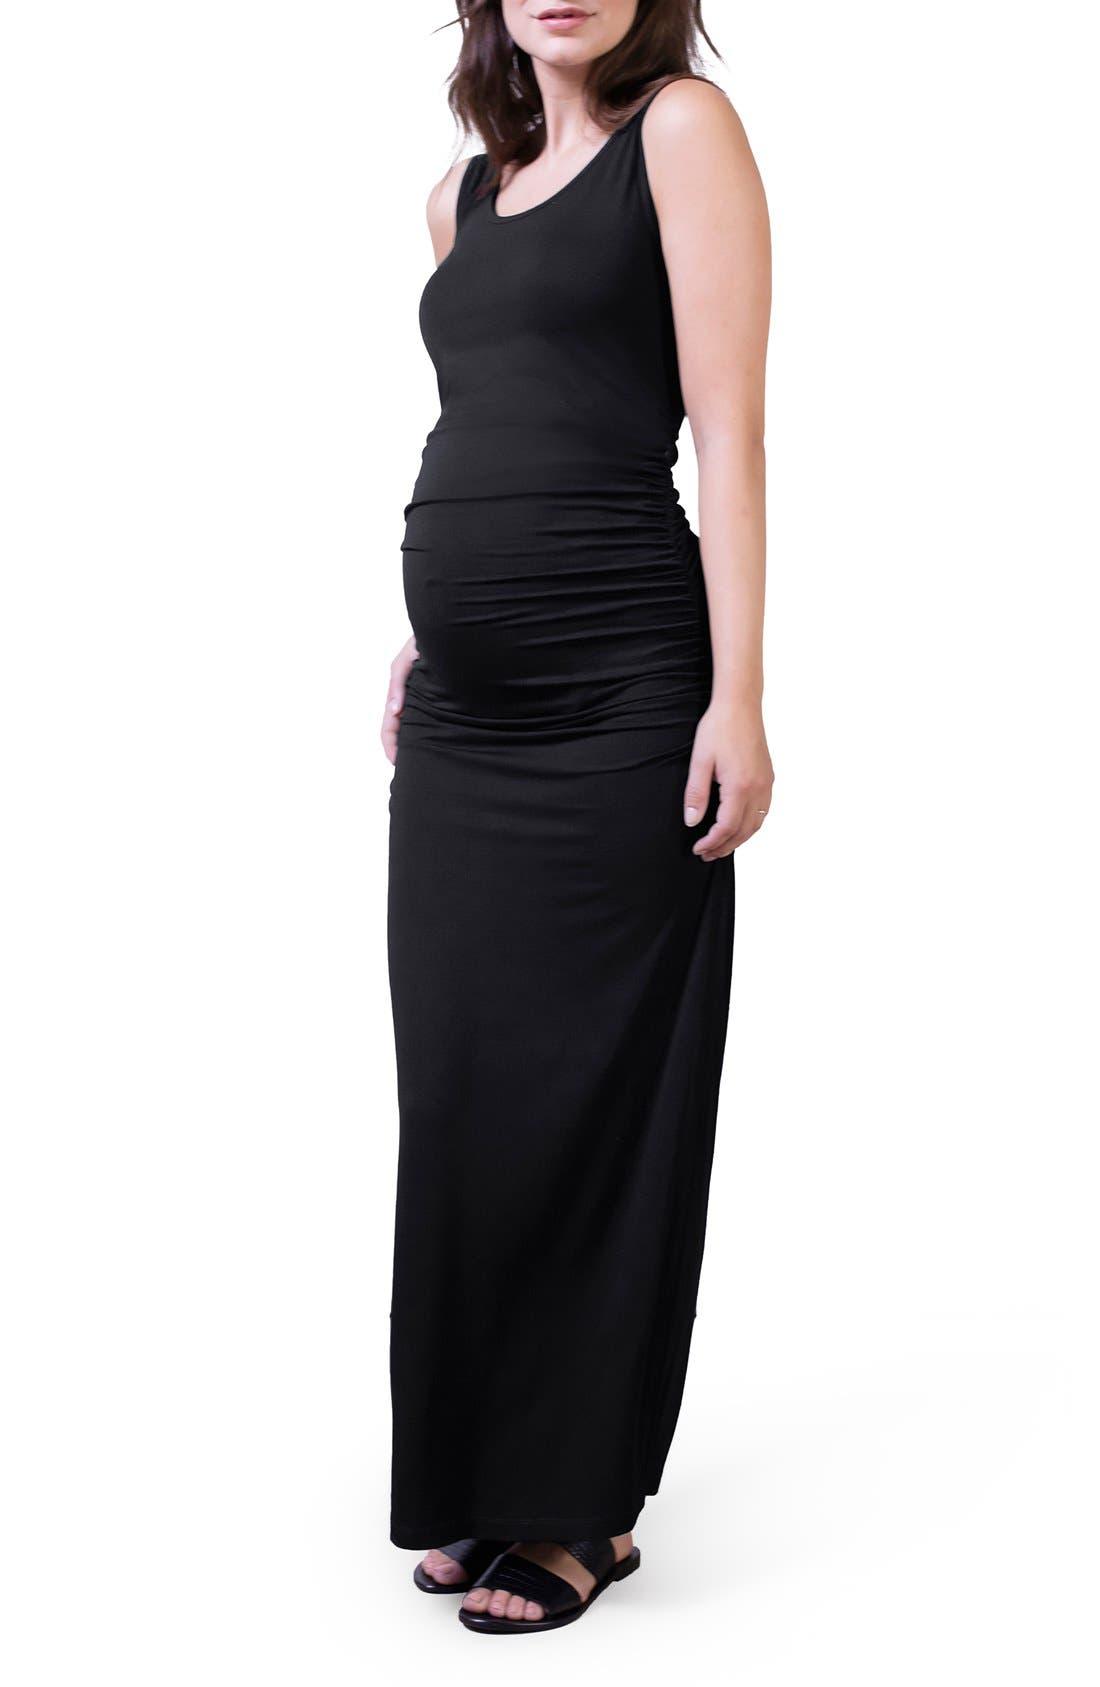 Isabella Oliver 'Lisle' Maternity Maxi Tank Dress